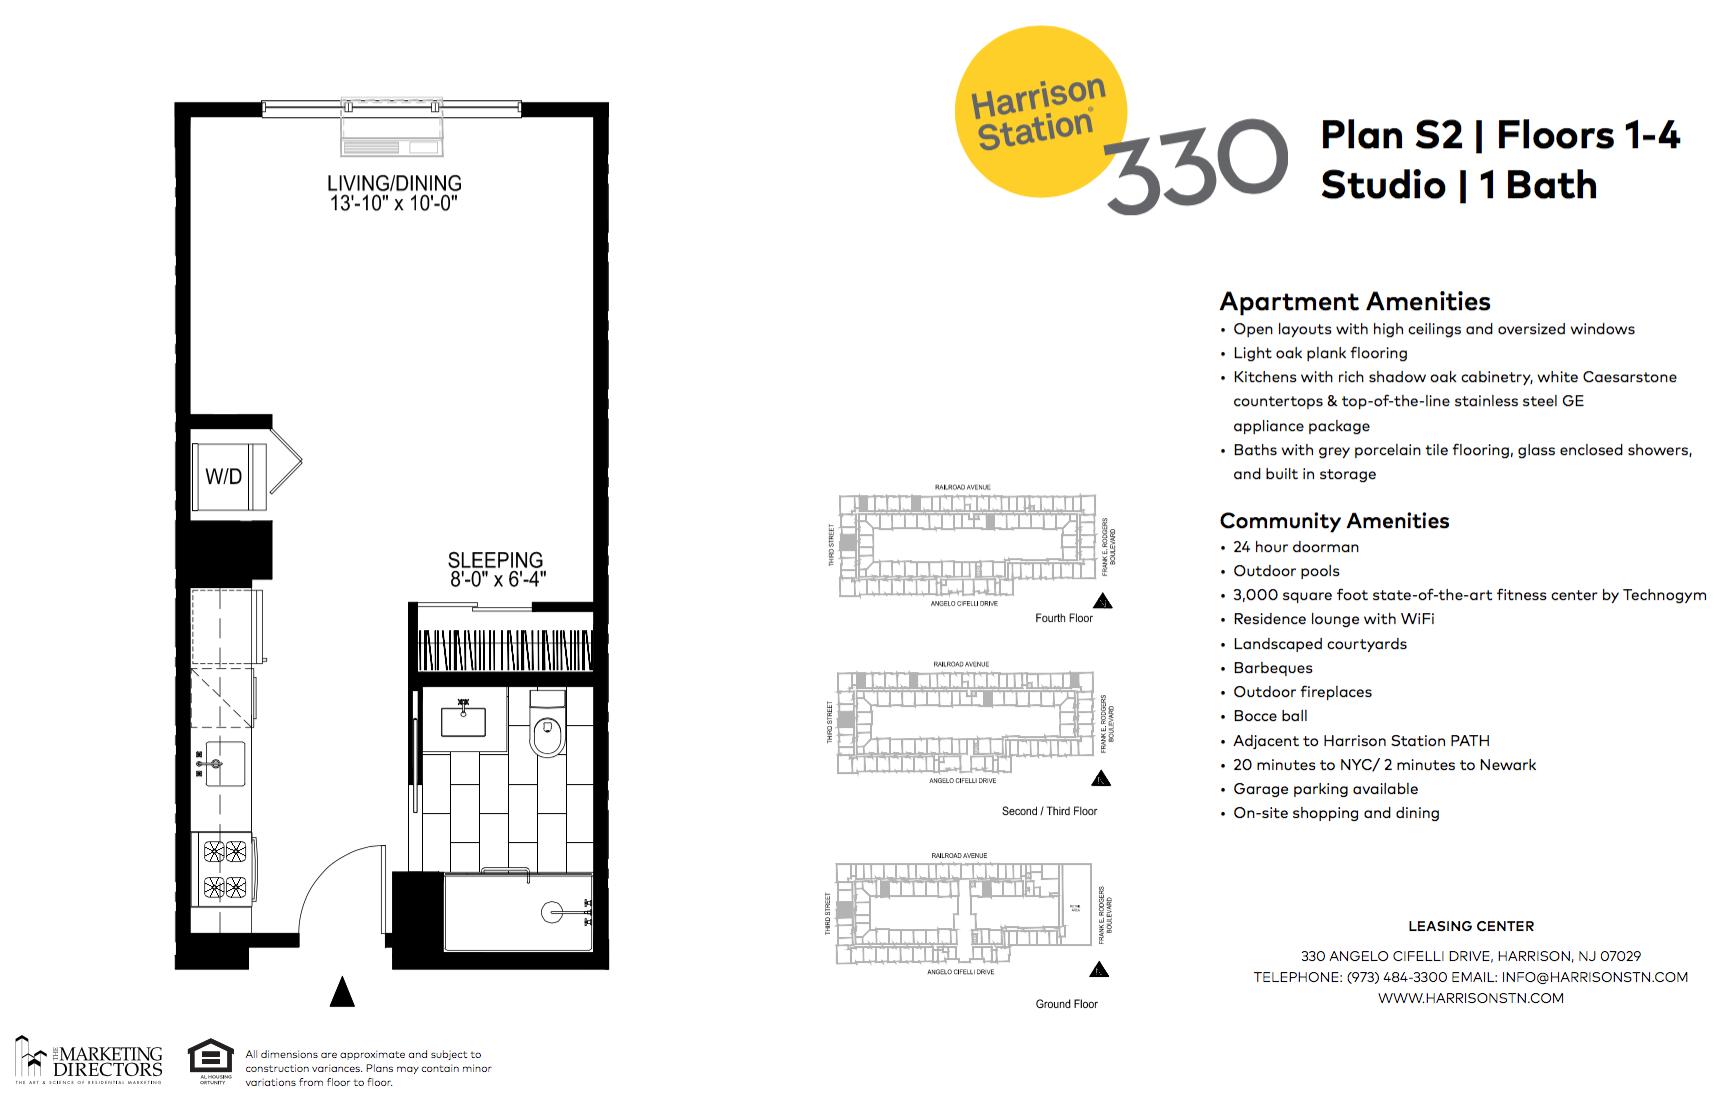 Studio Apartment Nj harrison luxury apartments for rent | harrison station 330 | applied